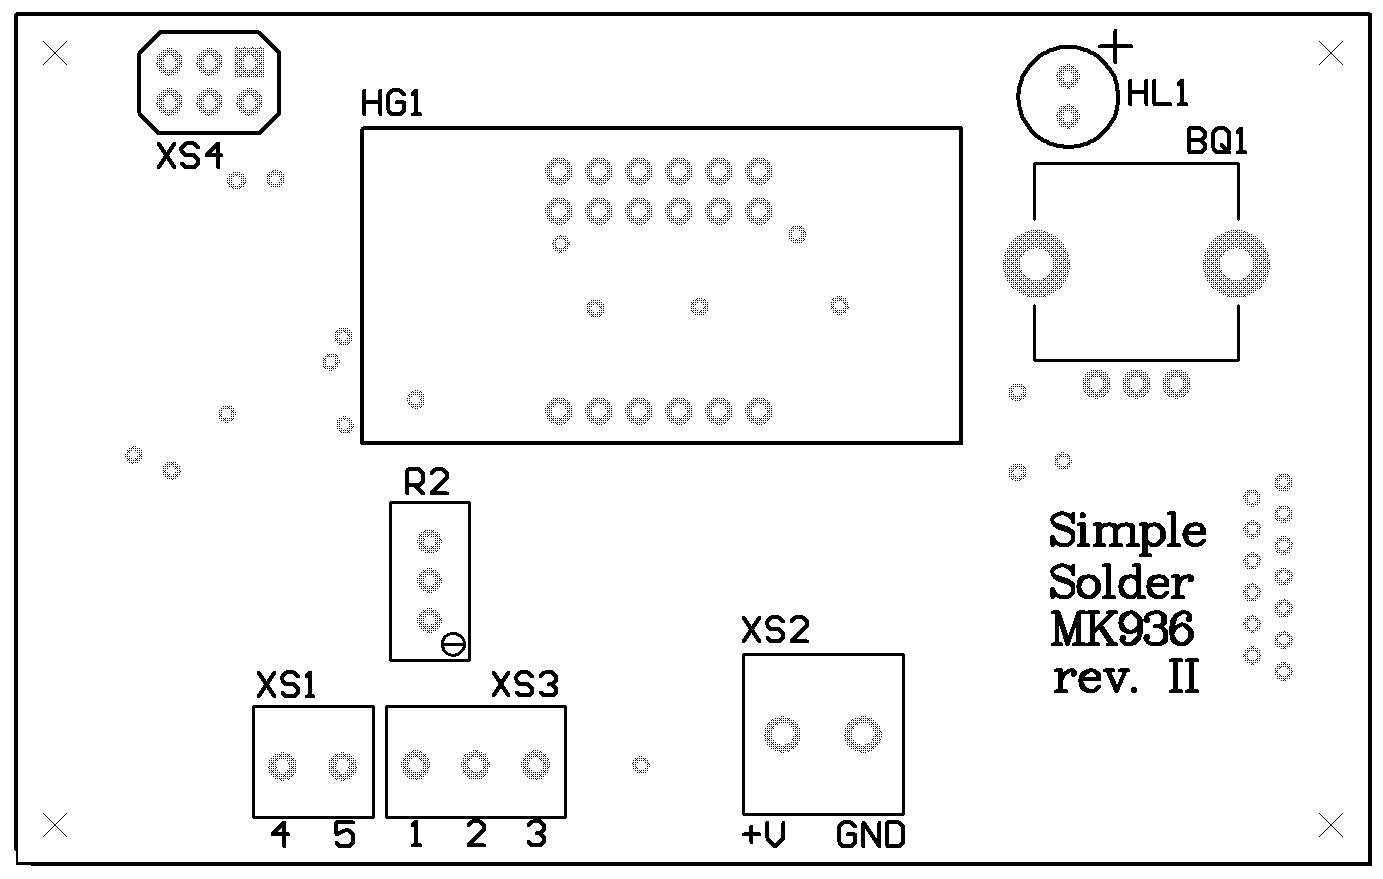 Simple Solder MK936 SMD. Паяльная станция на SMD-компонентах своими руками - 5